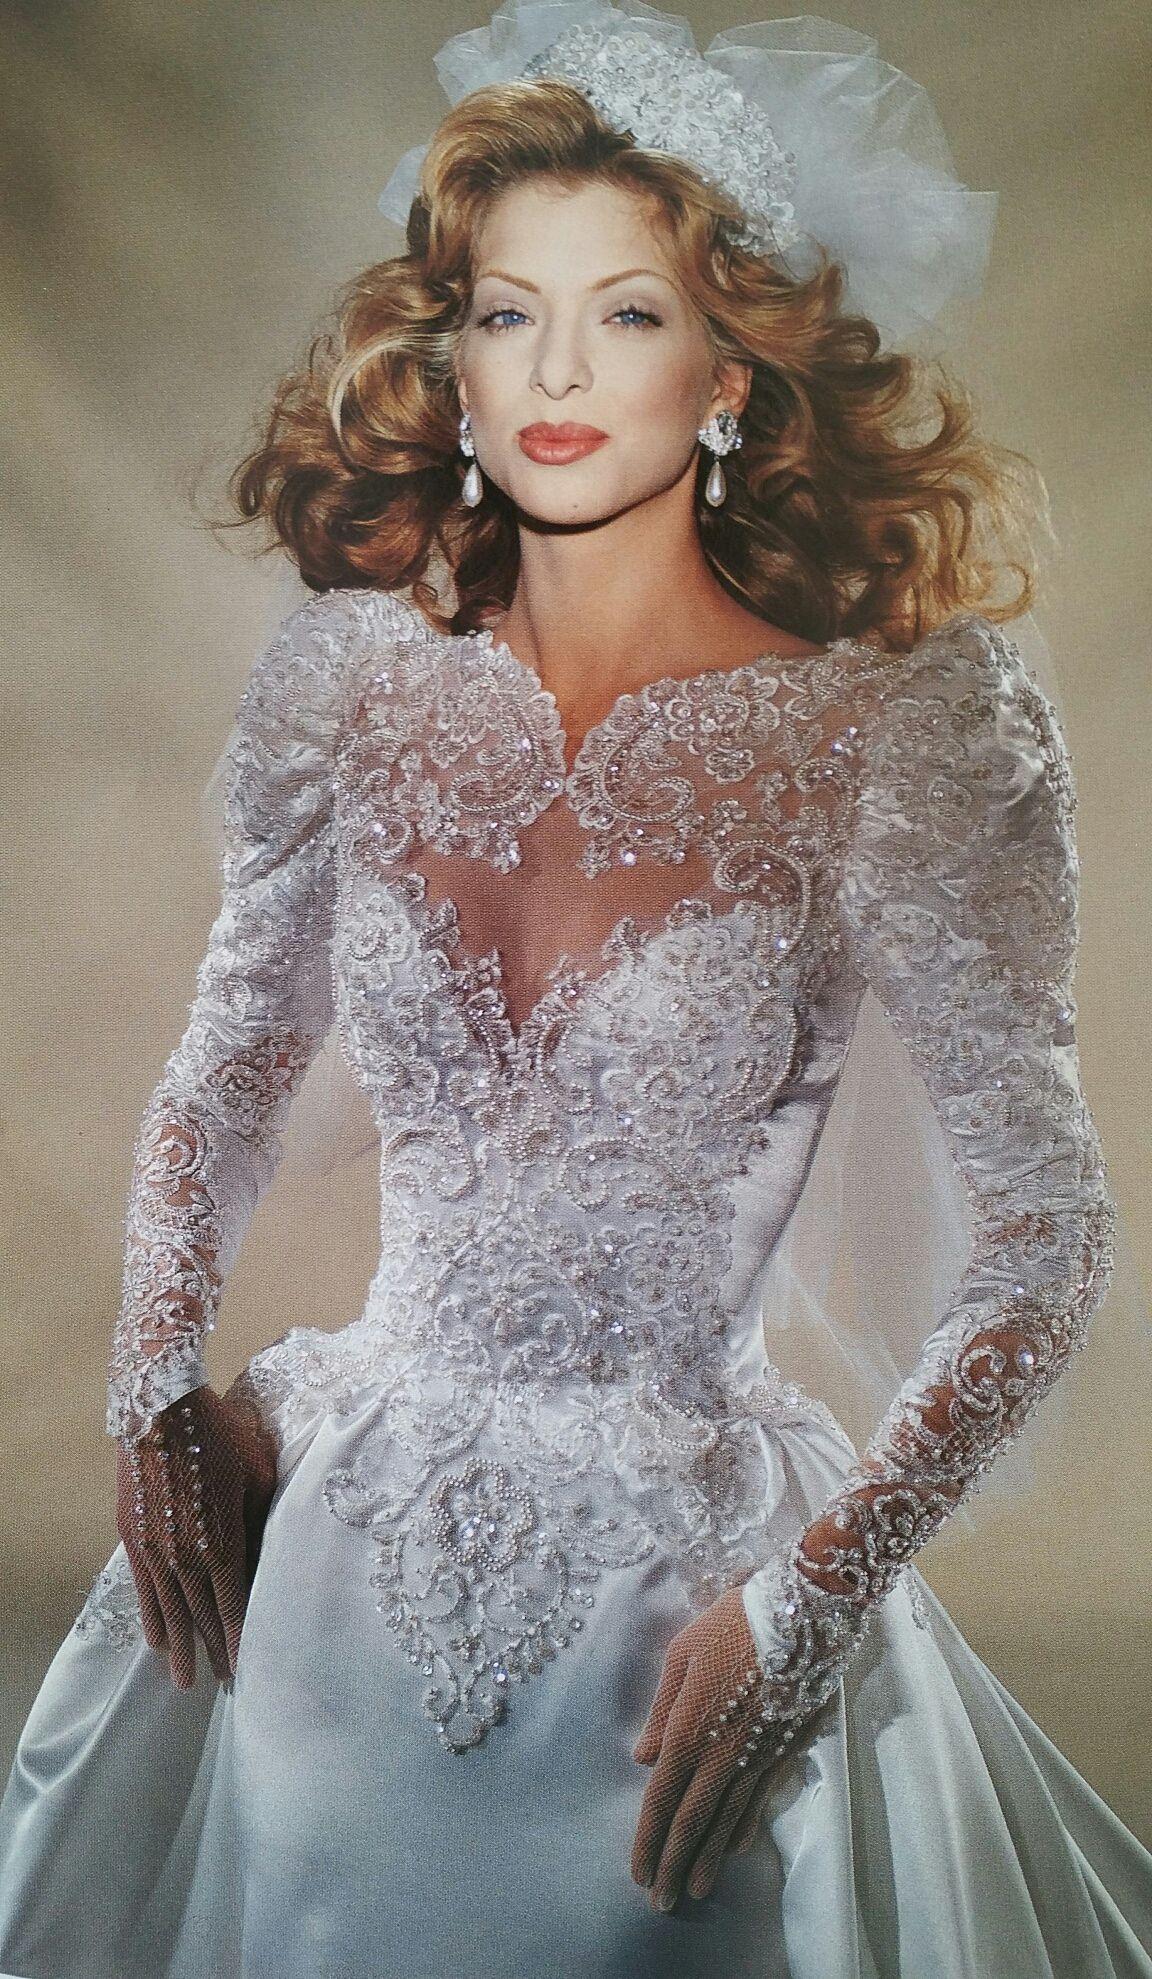 Demetrios close bodice view demetrios bride vintage gowns